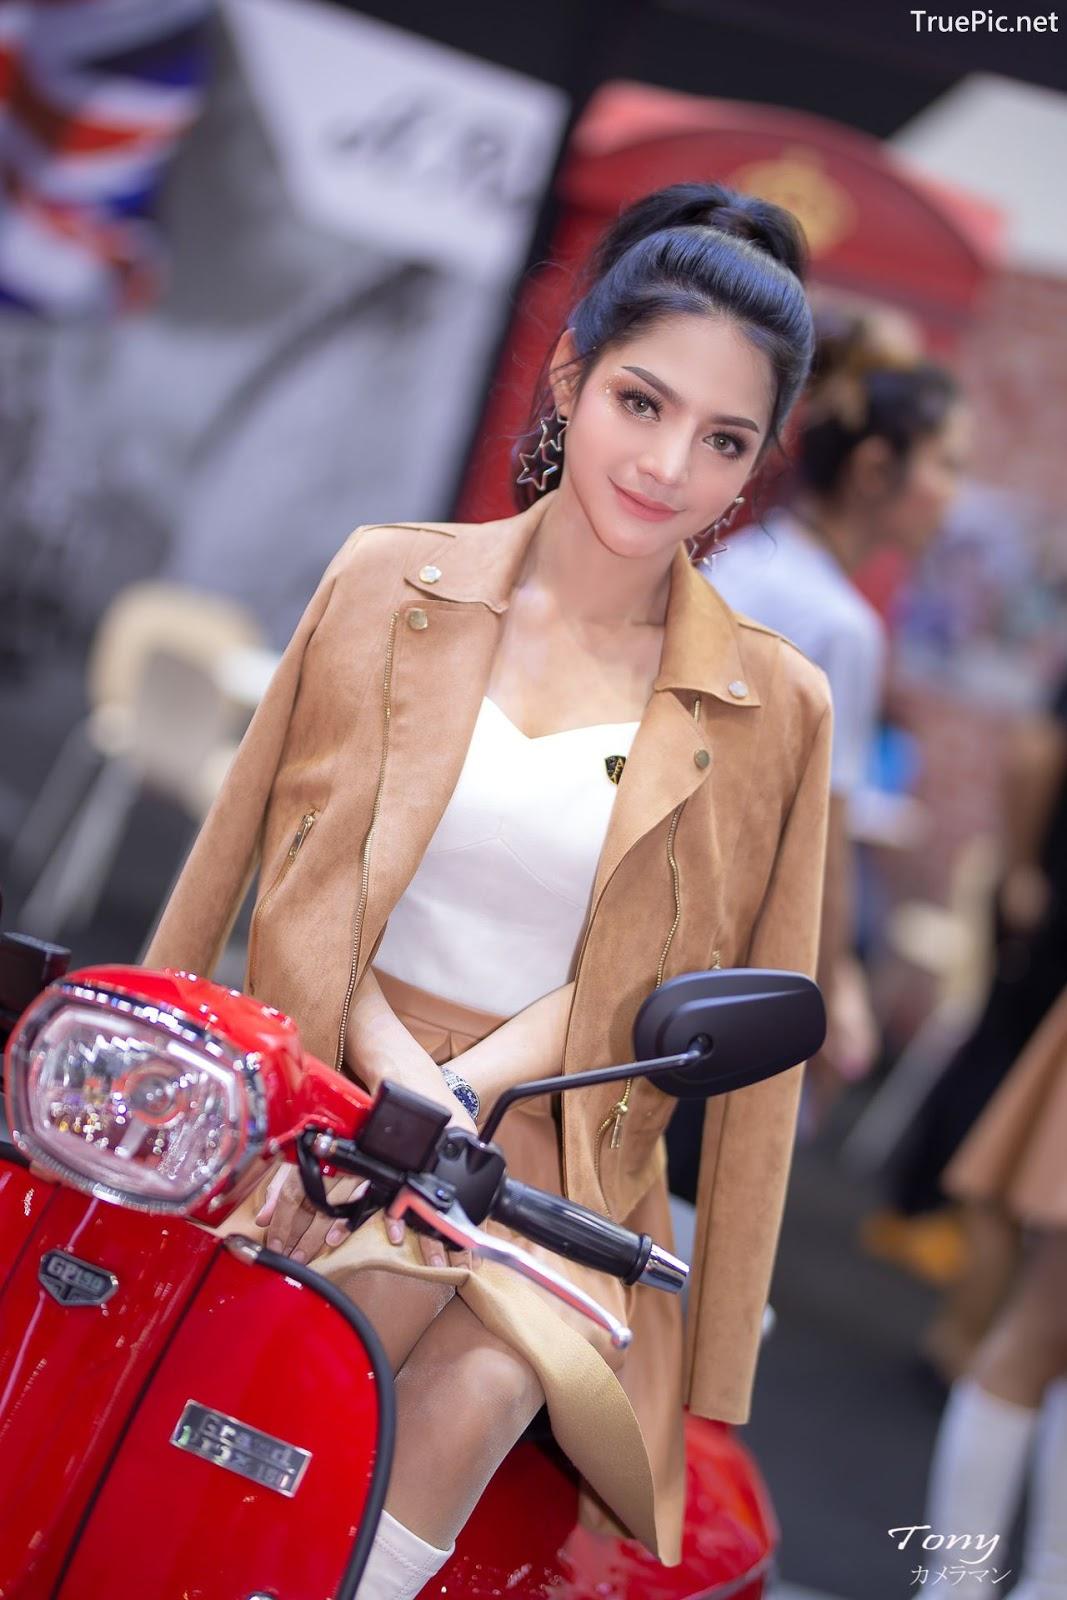 Thailand Hot Model - Thai Racing Girl At Motor Show 2019